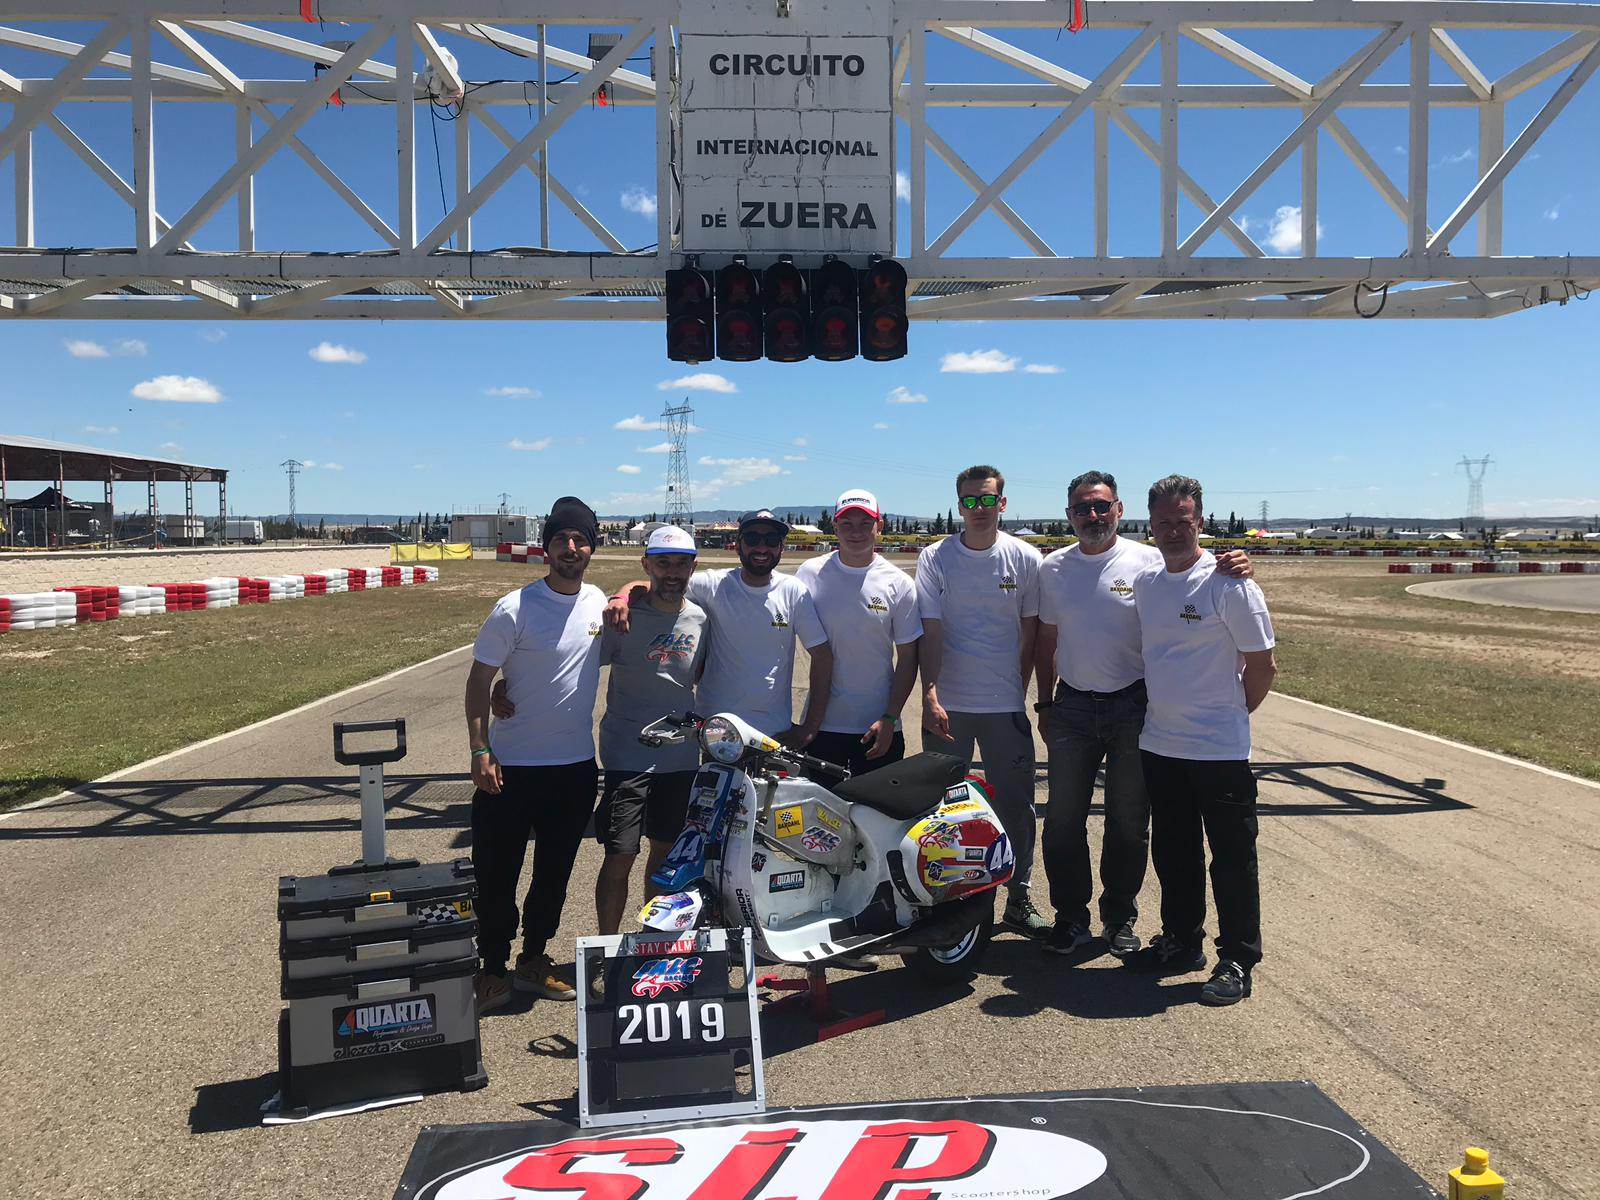 Vespa The Resistance 2019 in Zuera - Falc Team Sponsoring